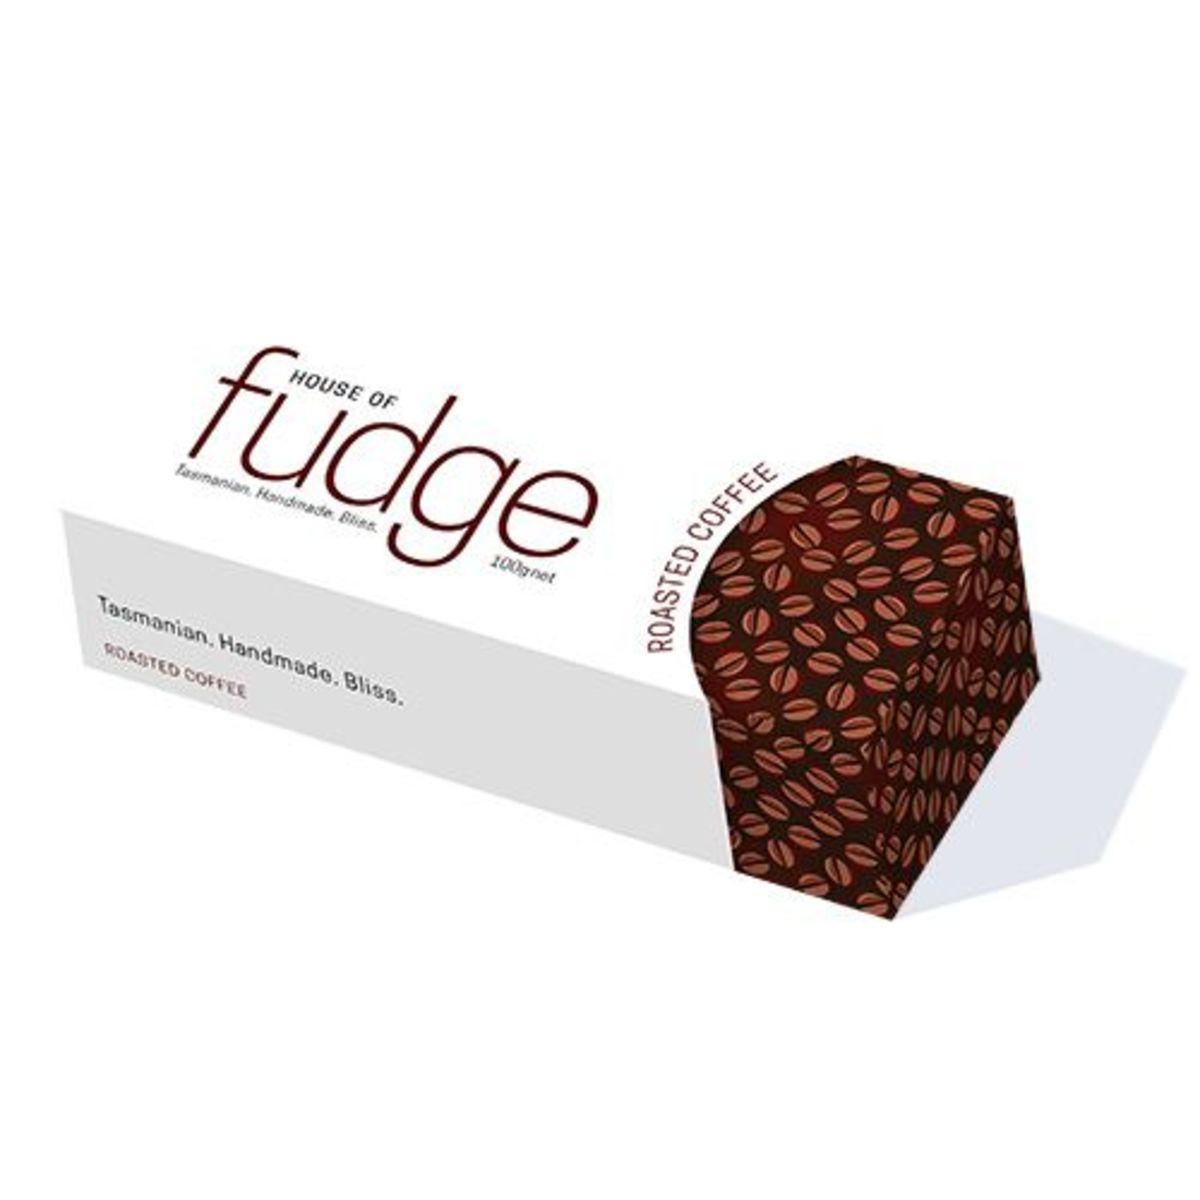 House of Fudge - Roasted Coffee